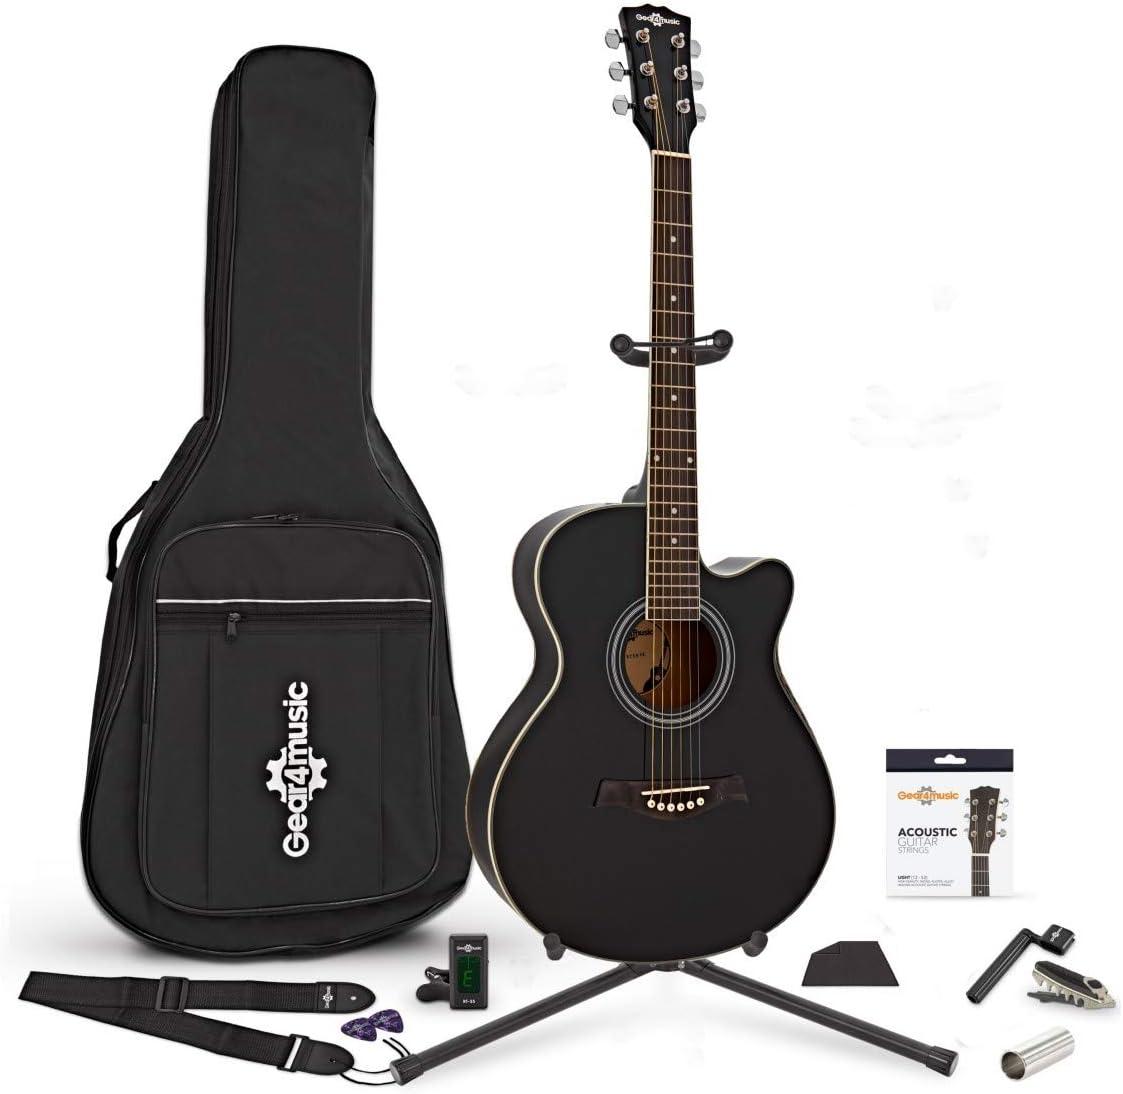 Set Completo de Gear4music de Guitarra Acústica con Cutaway Negra